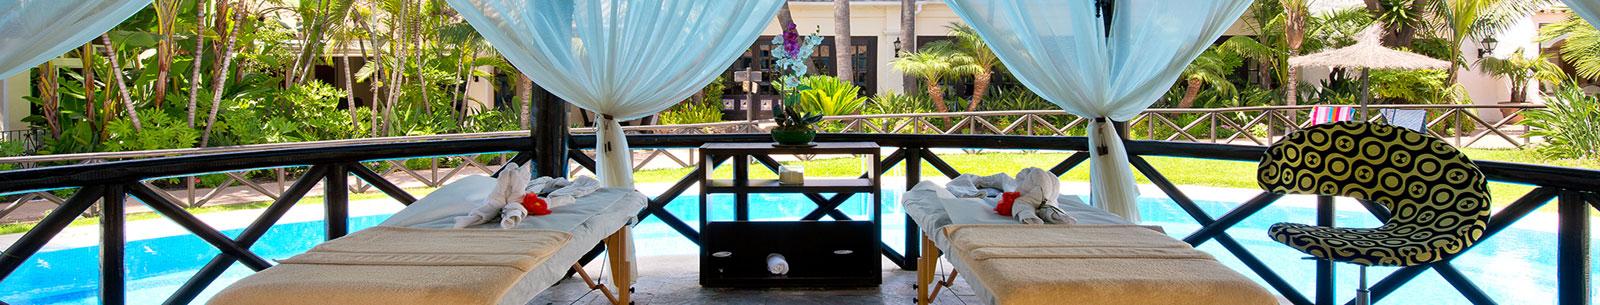 Hotels in Málaga - Bluebay Hotels & Resorts